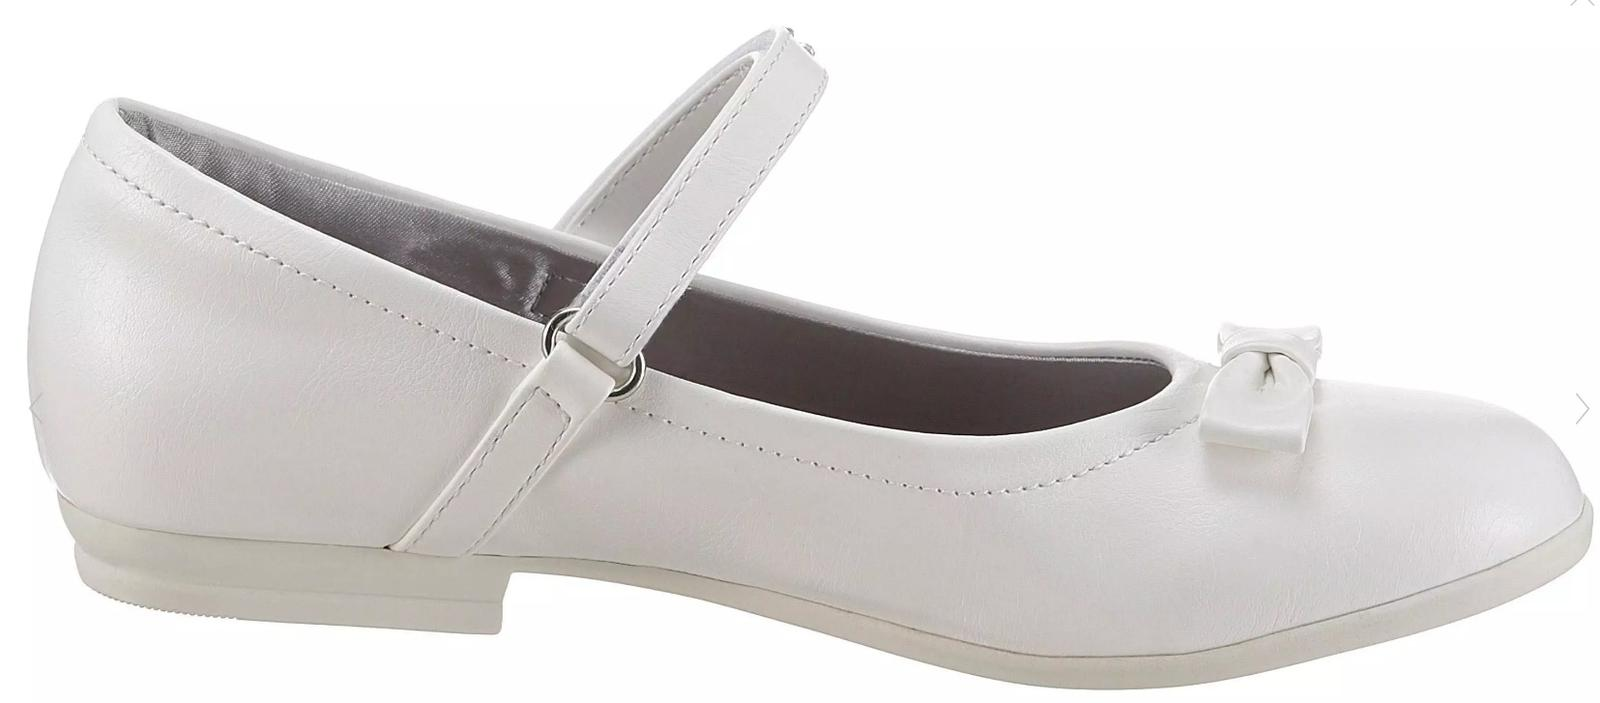 Svadobne / biele topanky - Obrázok č. 2